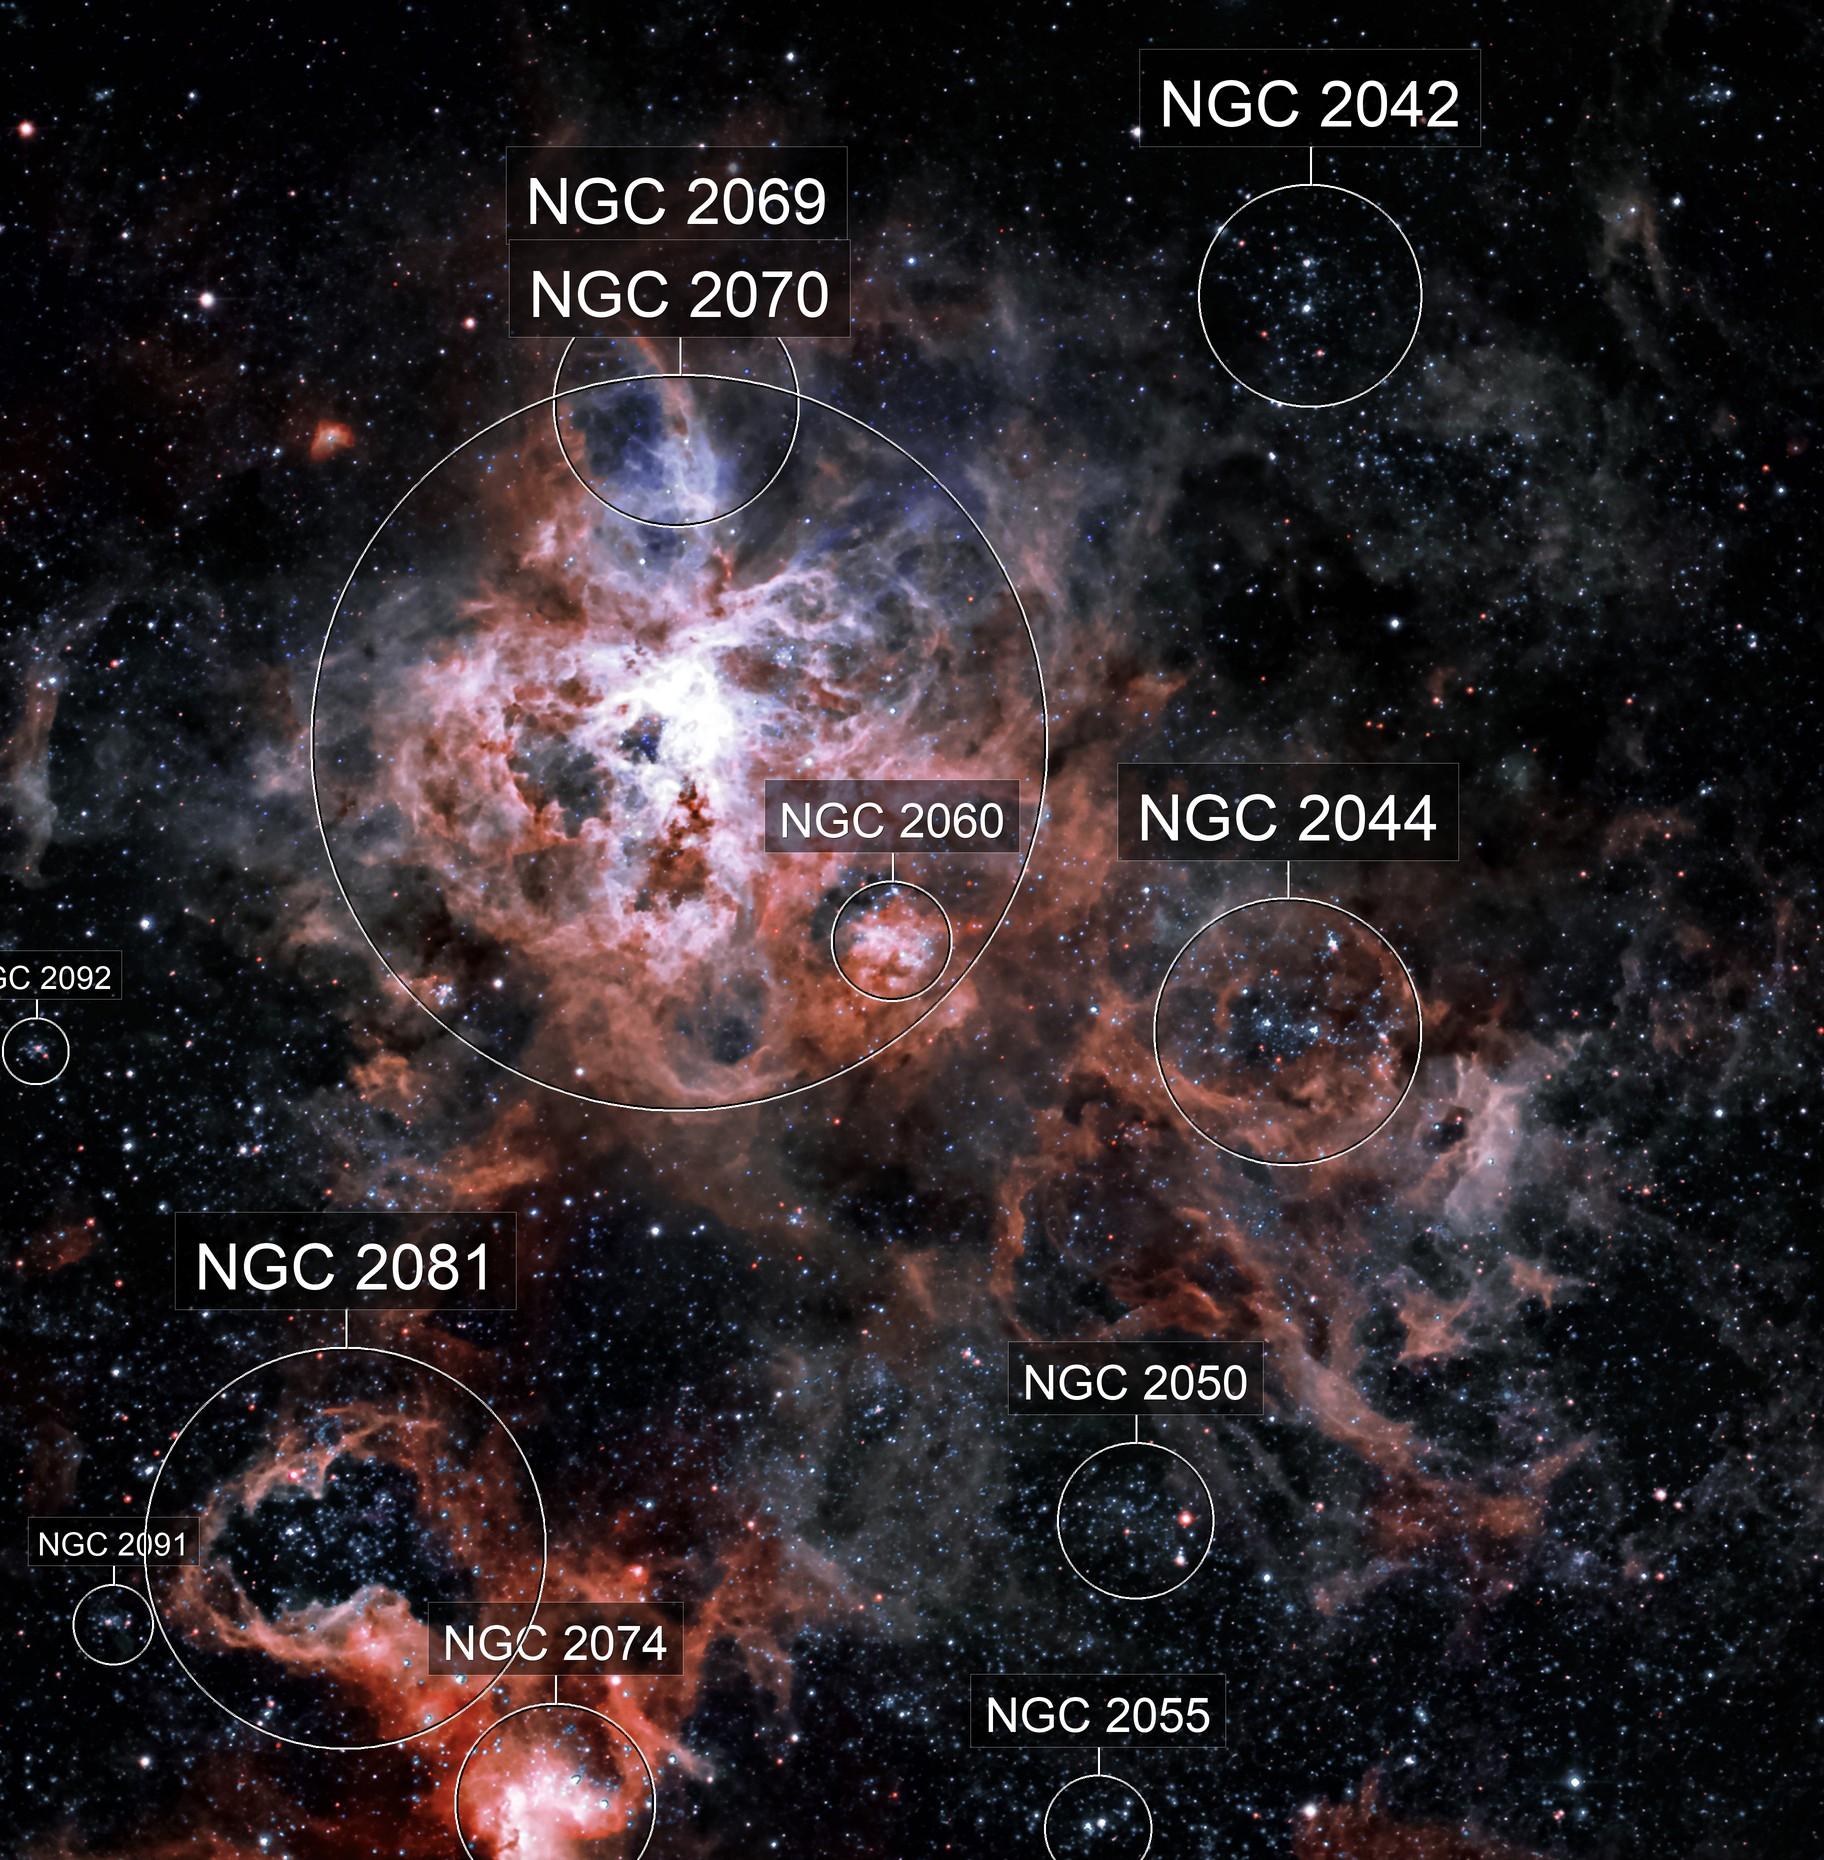 NGC 2070 Tarantula Nebula